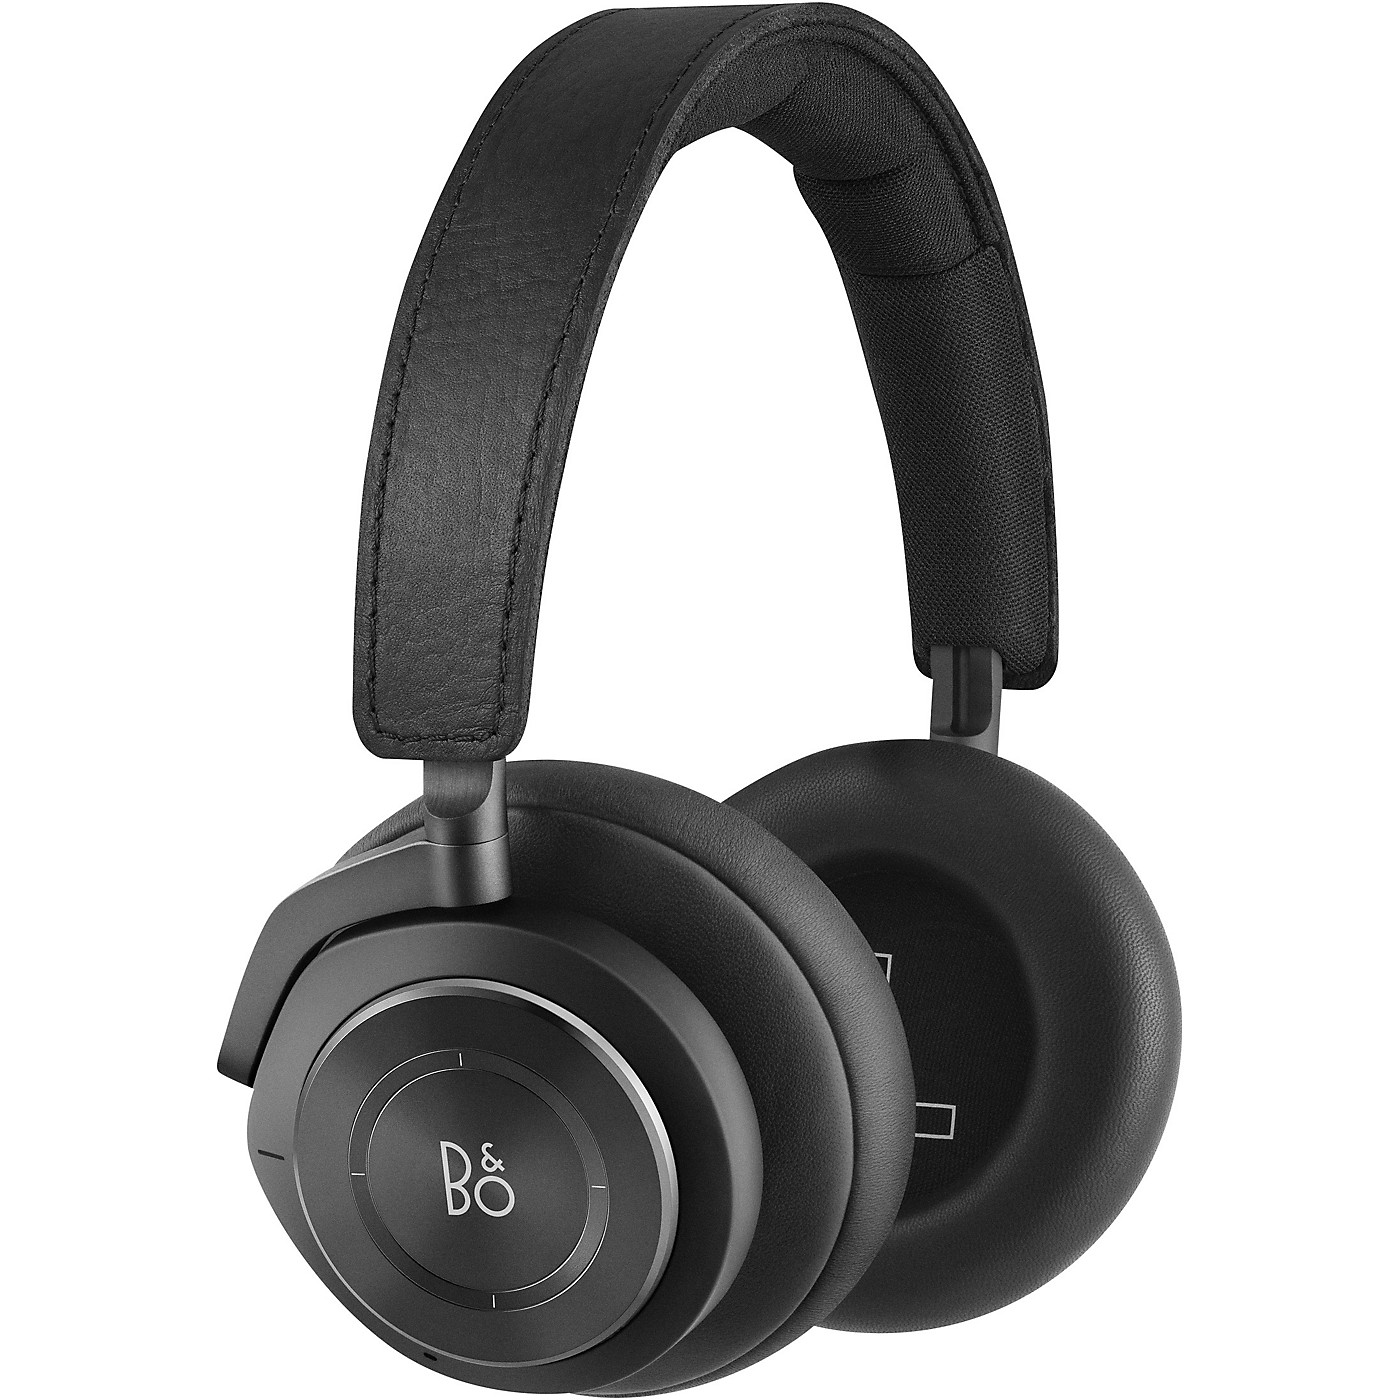 Bang & Olufsen Beoplay H9 3rd Gen Anc Bluetooth Headphones thumbnail